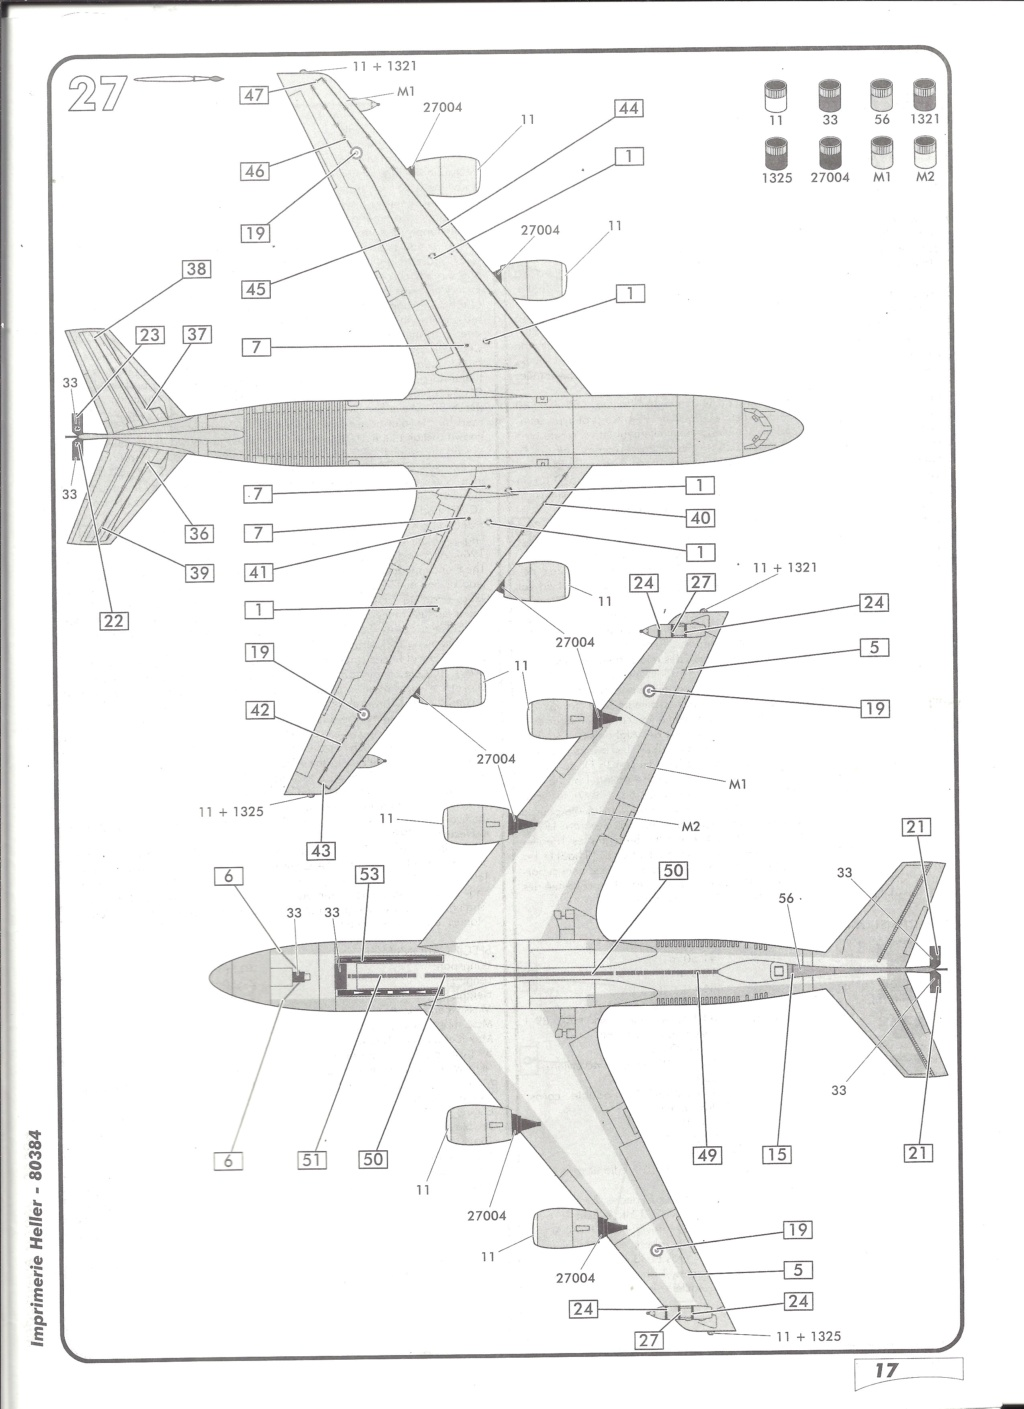 BOEING C 135 FR 1/72ème Ref 80384 Notice Helle599